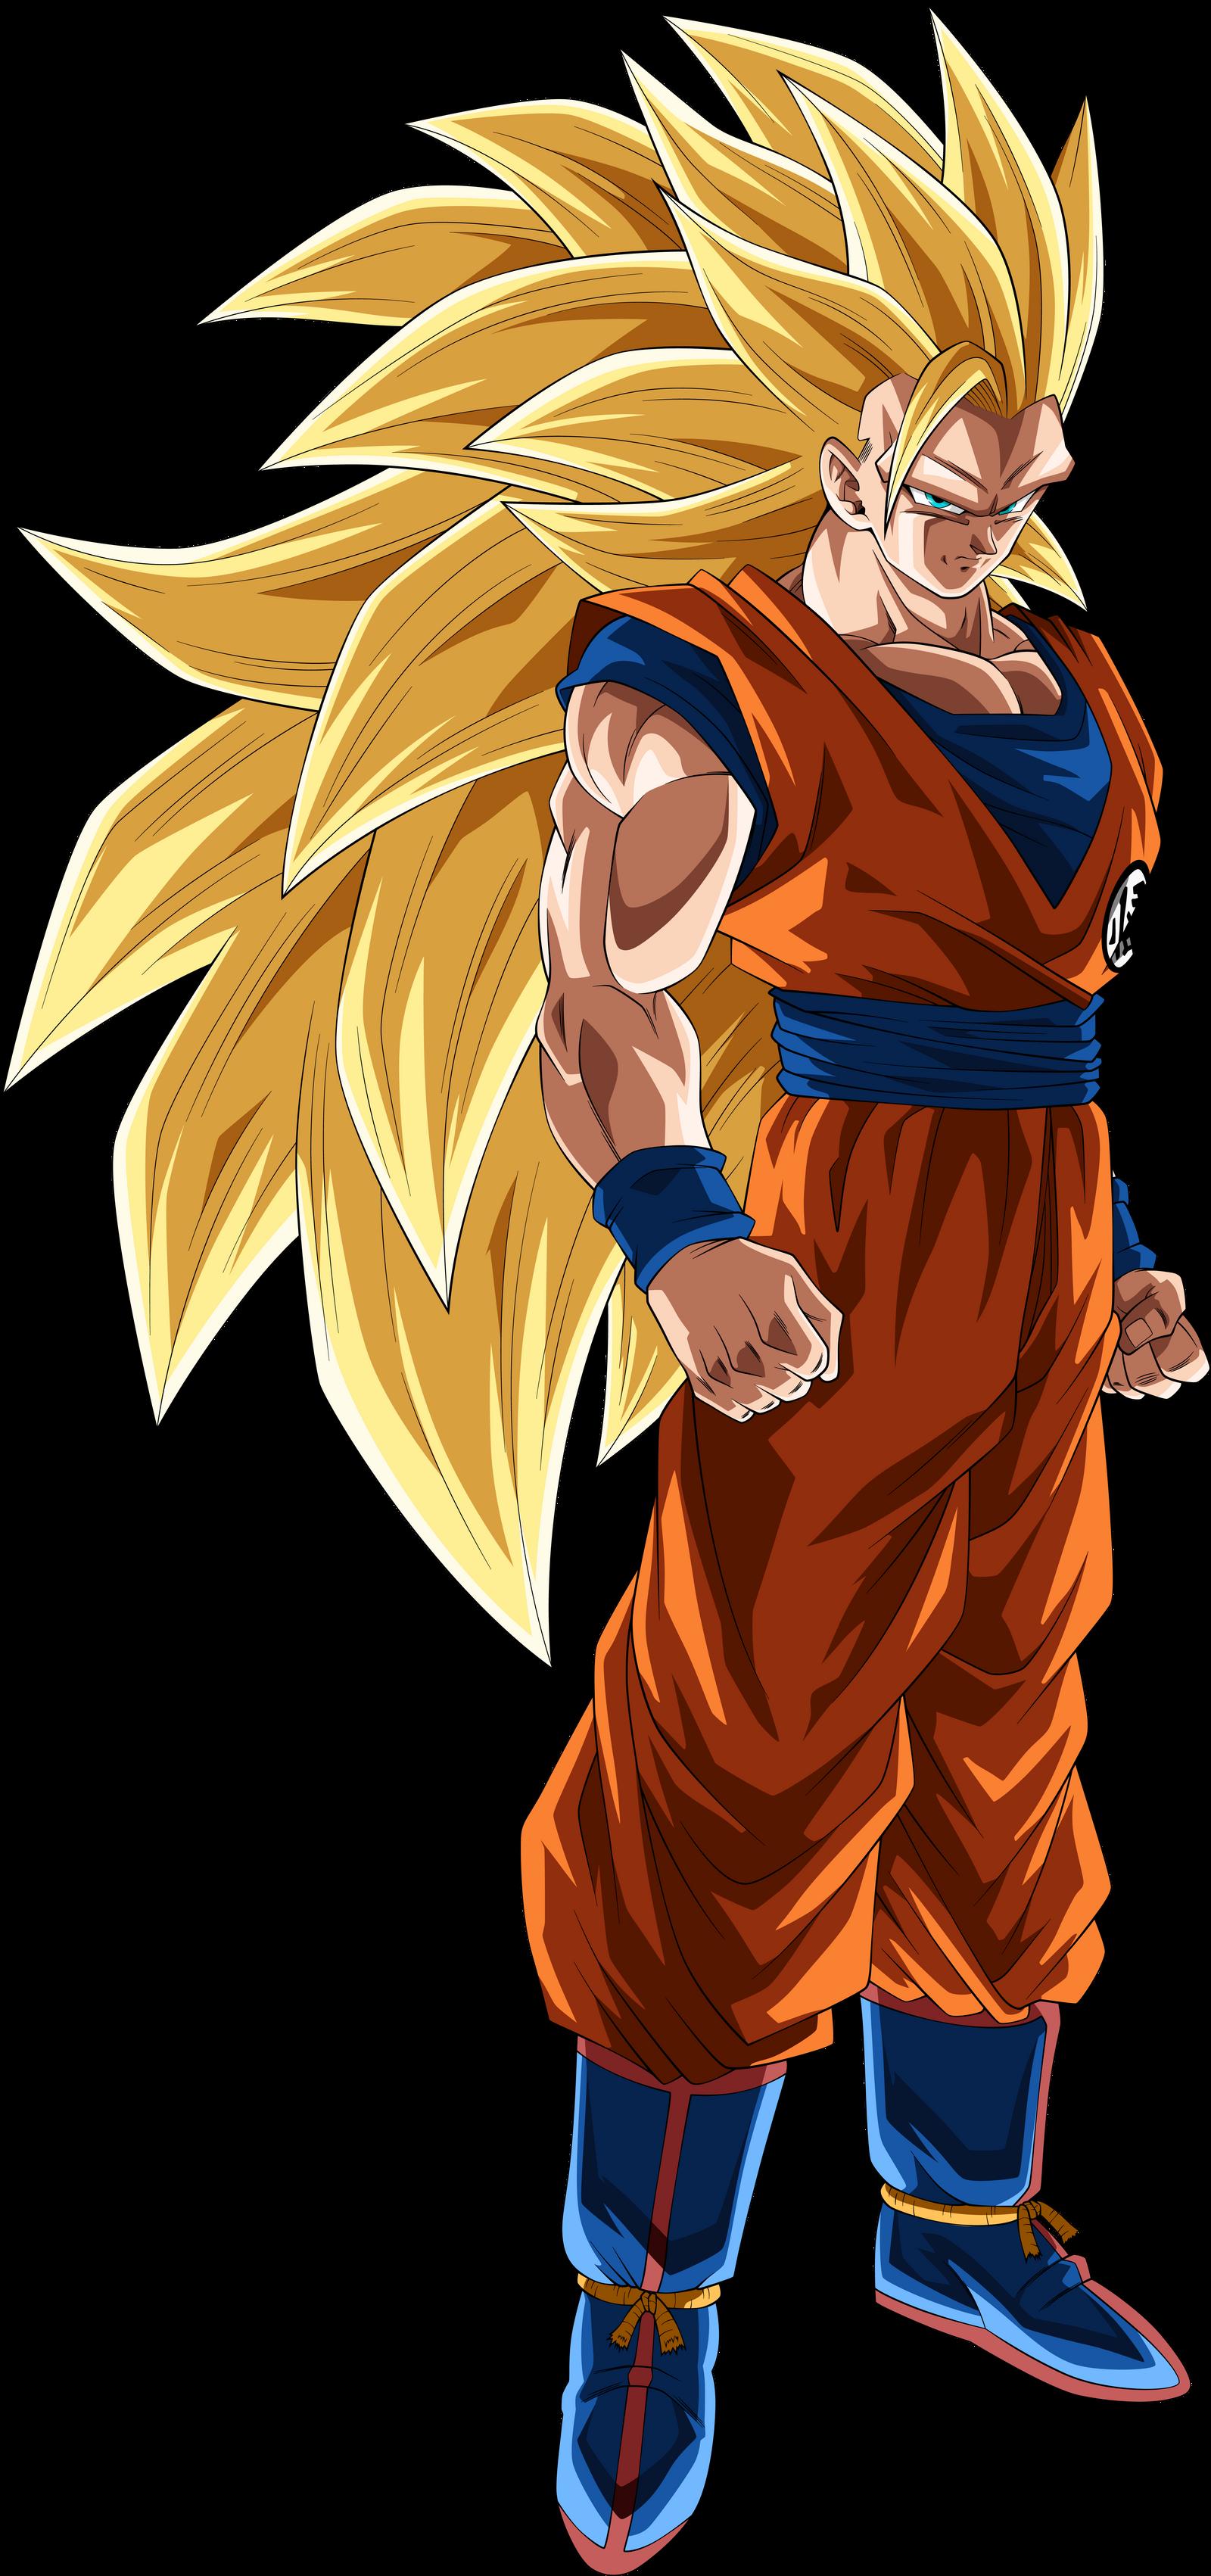 Goku (Super Saiyan 3) by TheTabbyNeko on DeviantArt